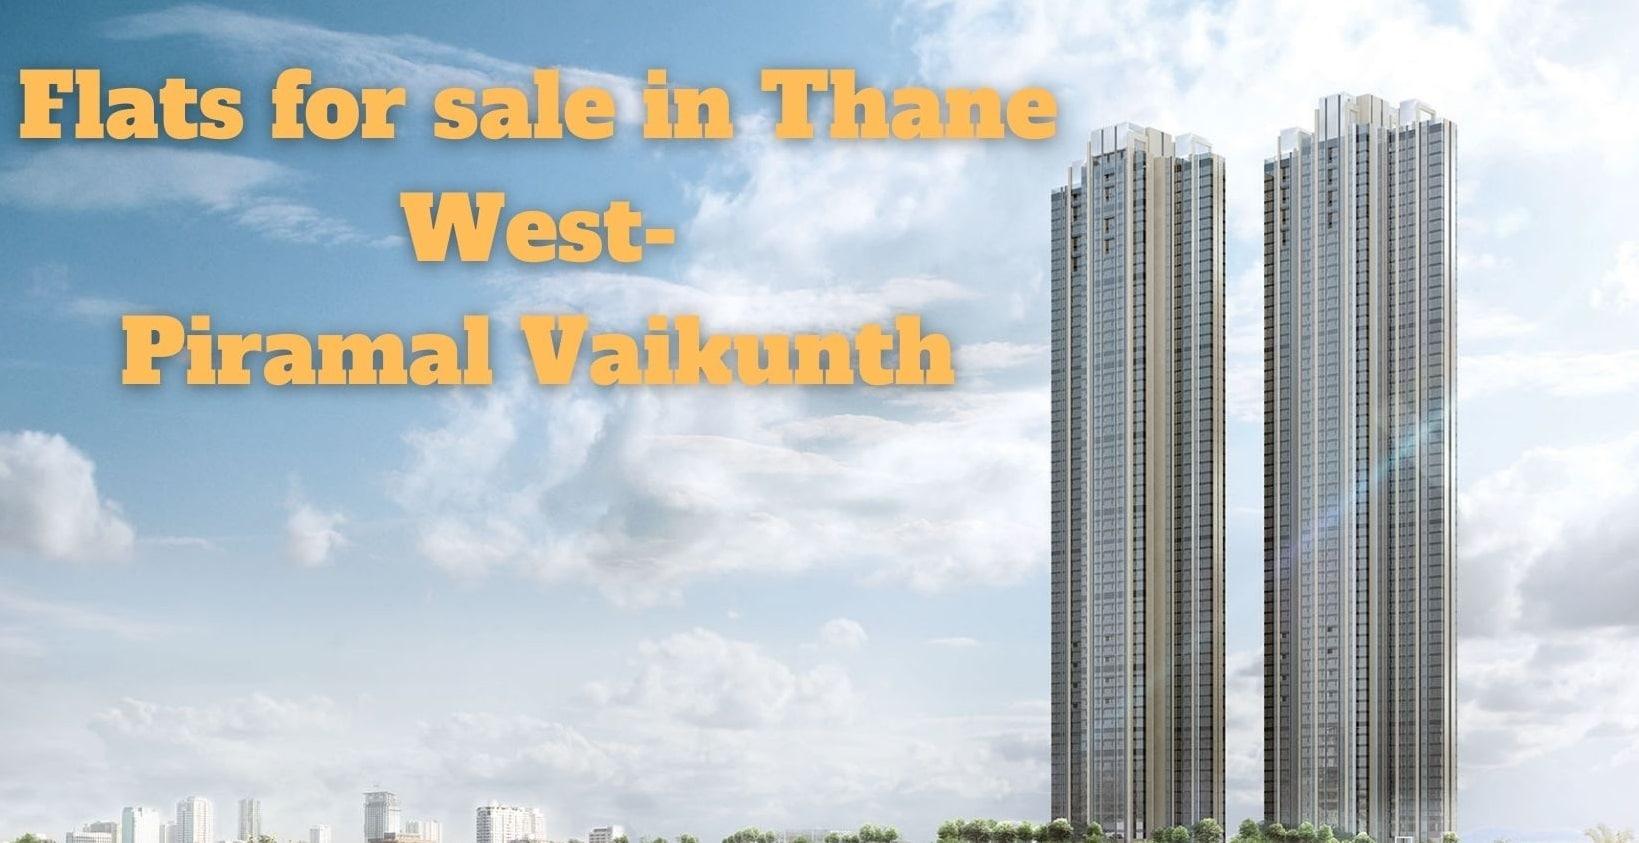 flats in Balkum Thane- Piramal Vaikunth